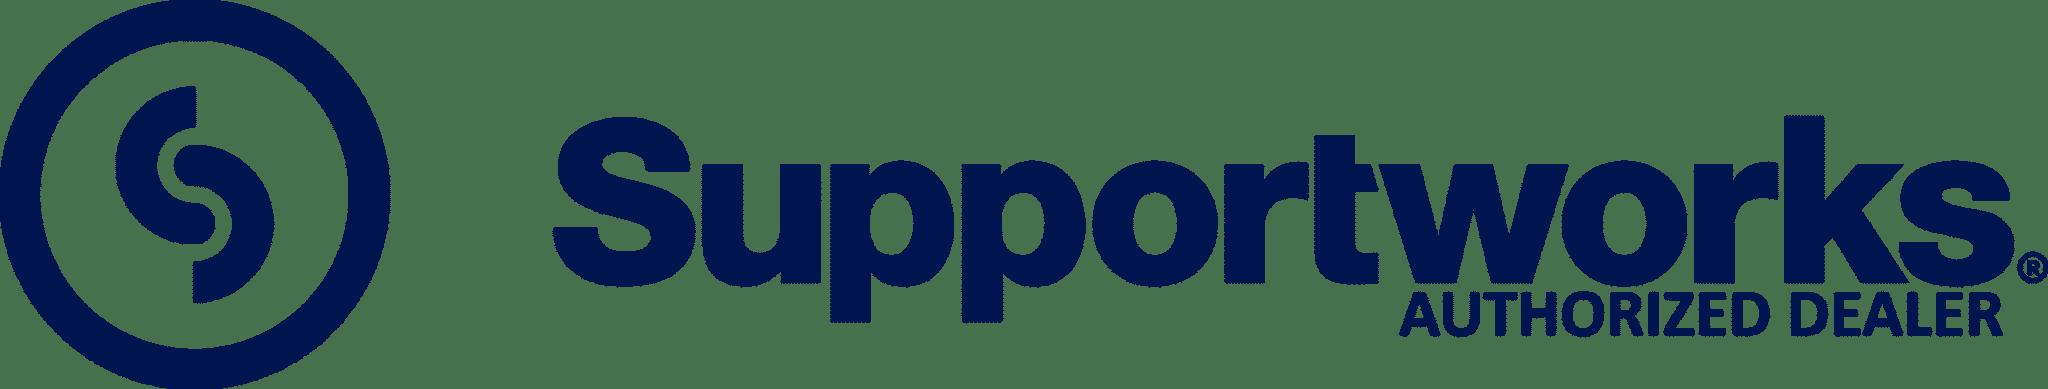 Supportworks authorized dealer logo